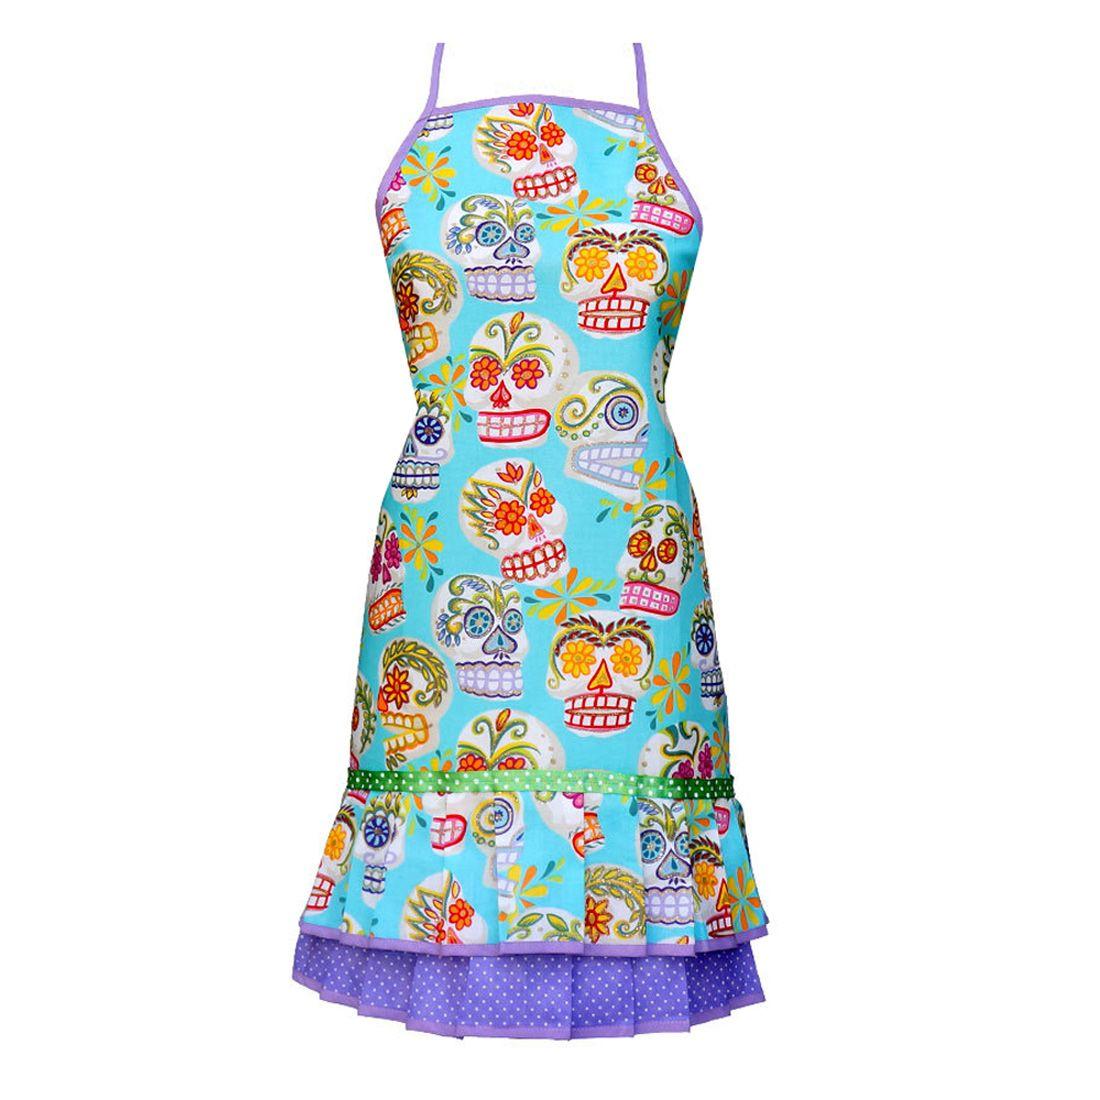 Calavares Turquoise Fifi apron  #sugarskull #dayofthedead #skulls #skeleton #gifts #homeware #homedecor #apron #retroapron #retro #kitchen #baking #chef